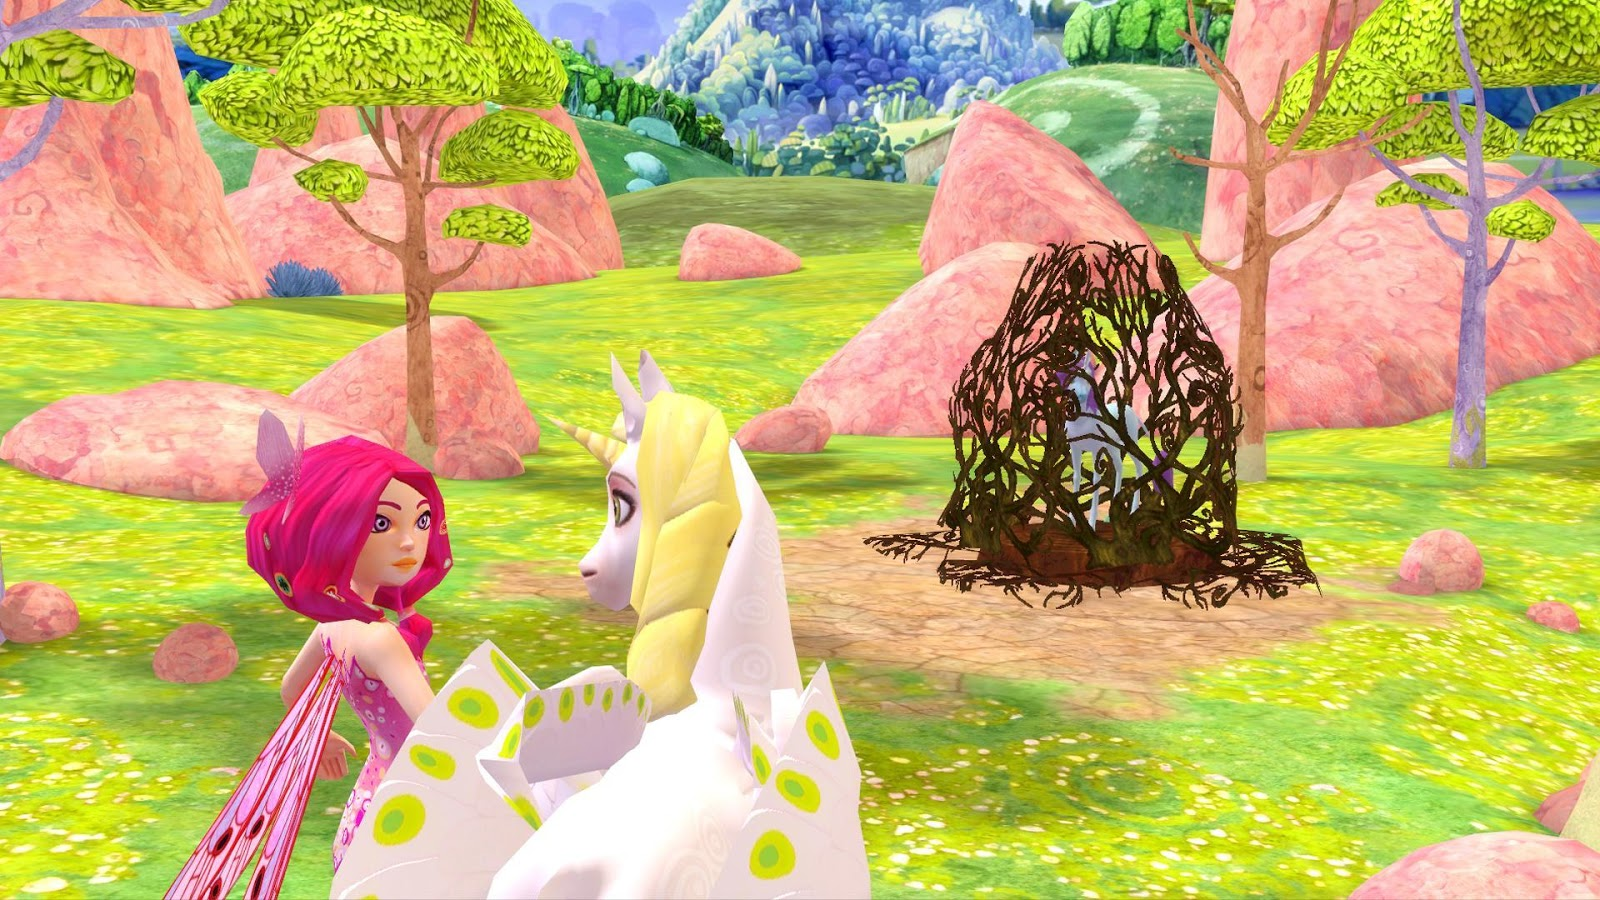 Mia and me unicorn coloring pages - Mia And Me Free The Unicorns Screenshot